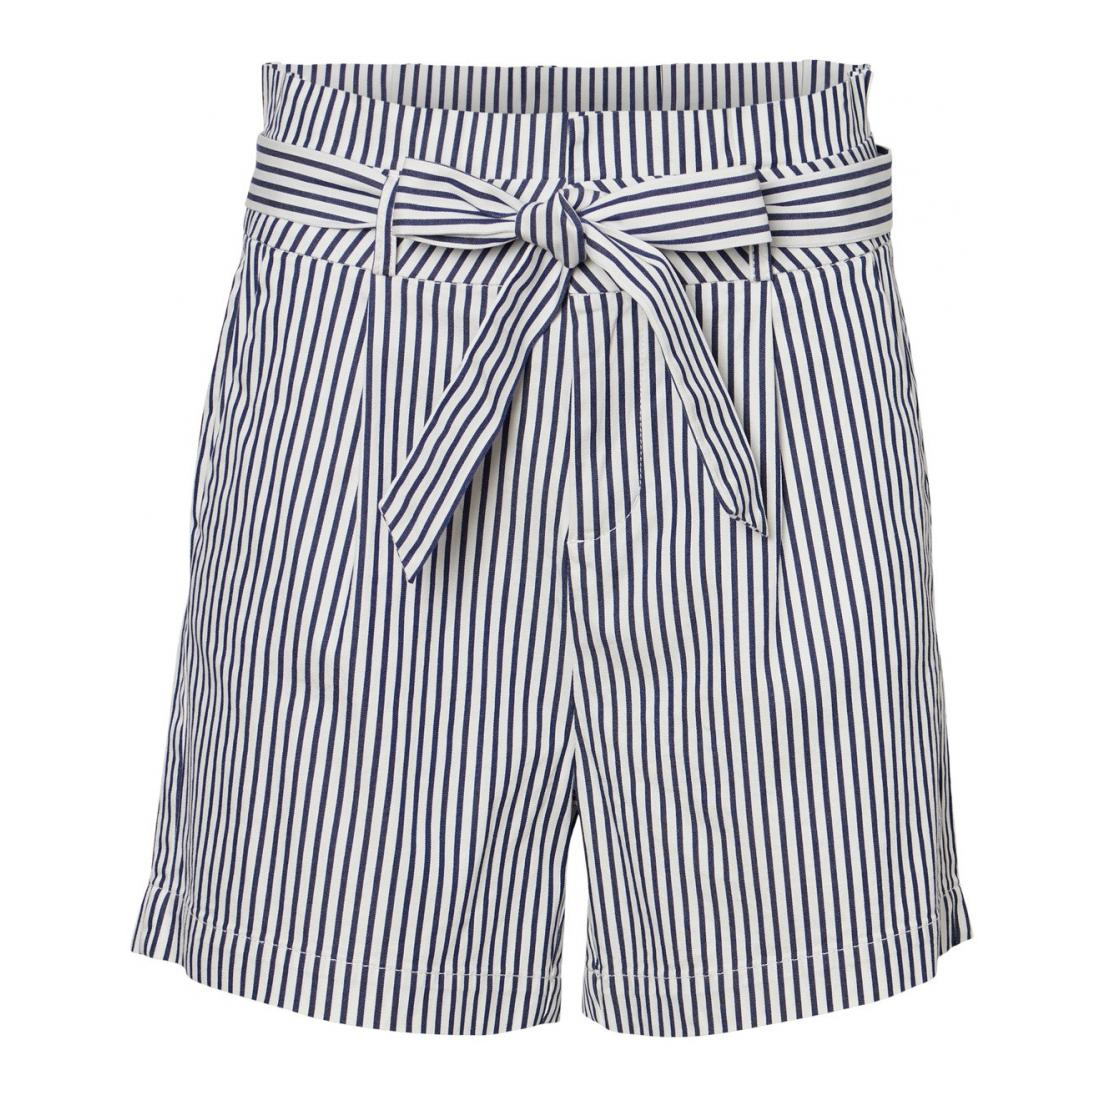 Vero Moda Bermuda/Shorts Damen VMEVA HR PAPERBAG COT PS